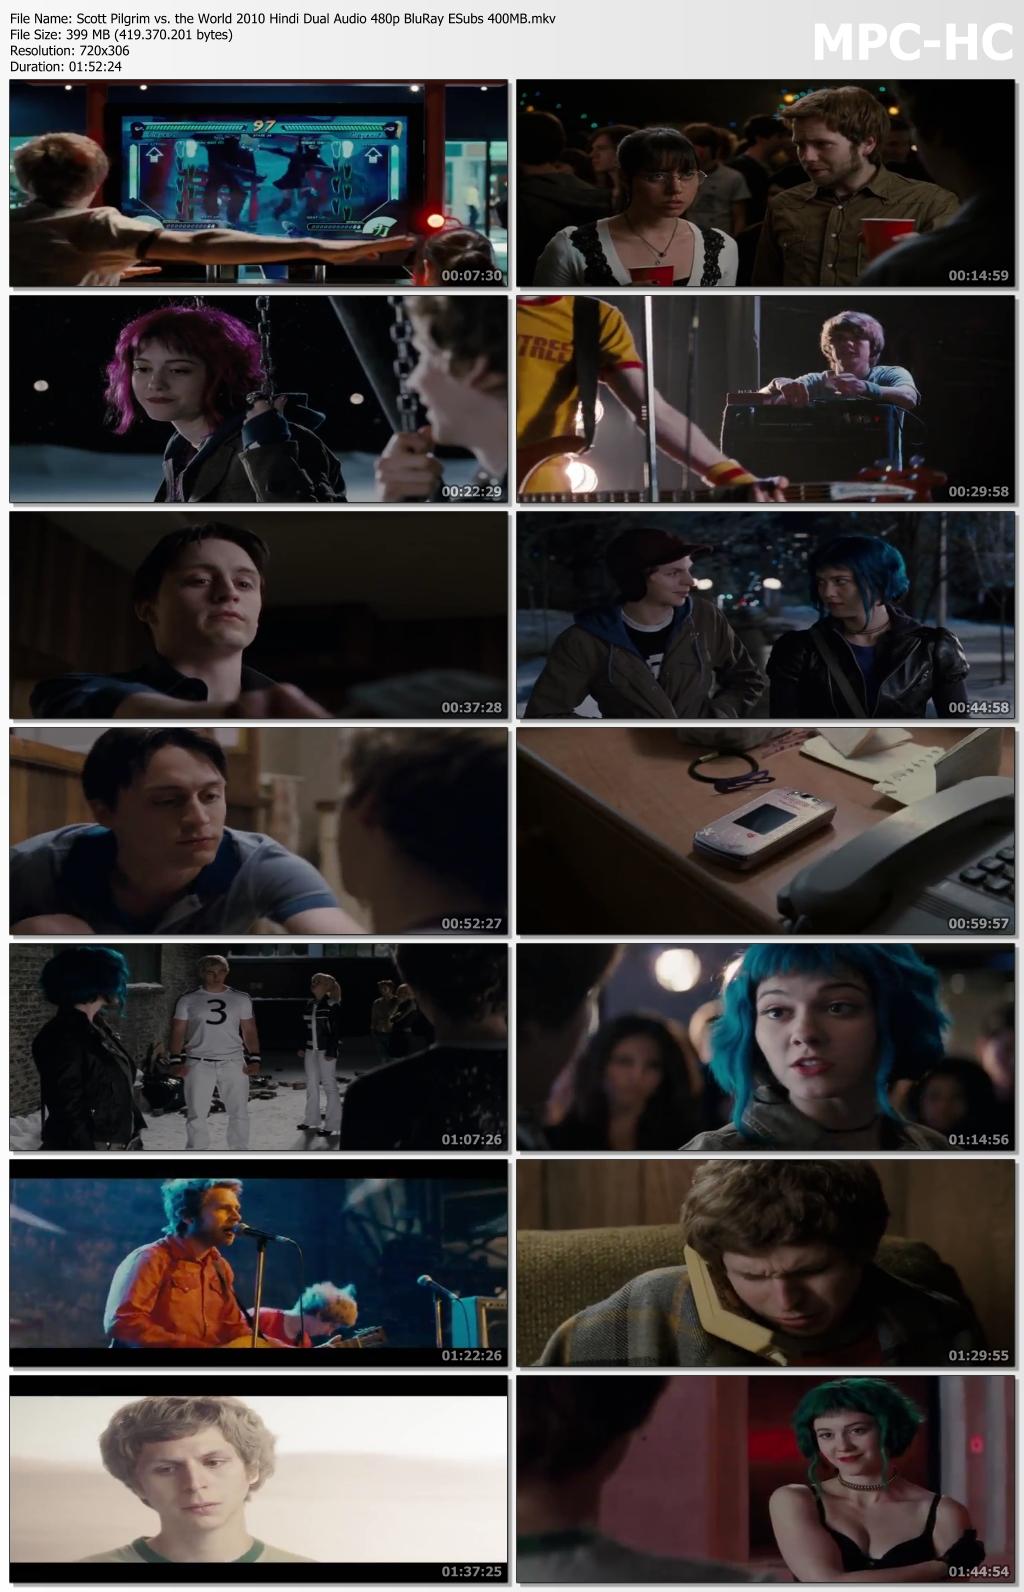 Scott-Pilgrim-vs-the-World-2010-Hindi-Dual-Audio-480p-Blu-Ray-ESubs-400-MB-mkv-thumbs